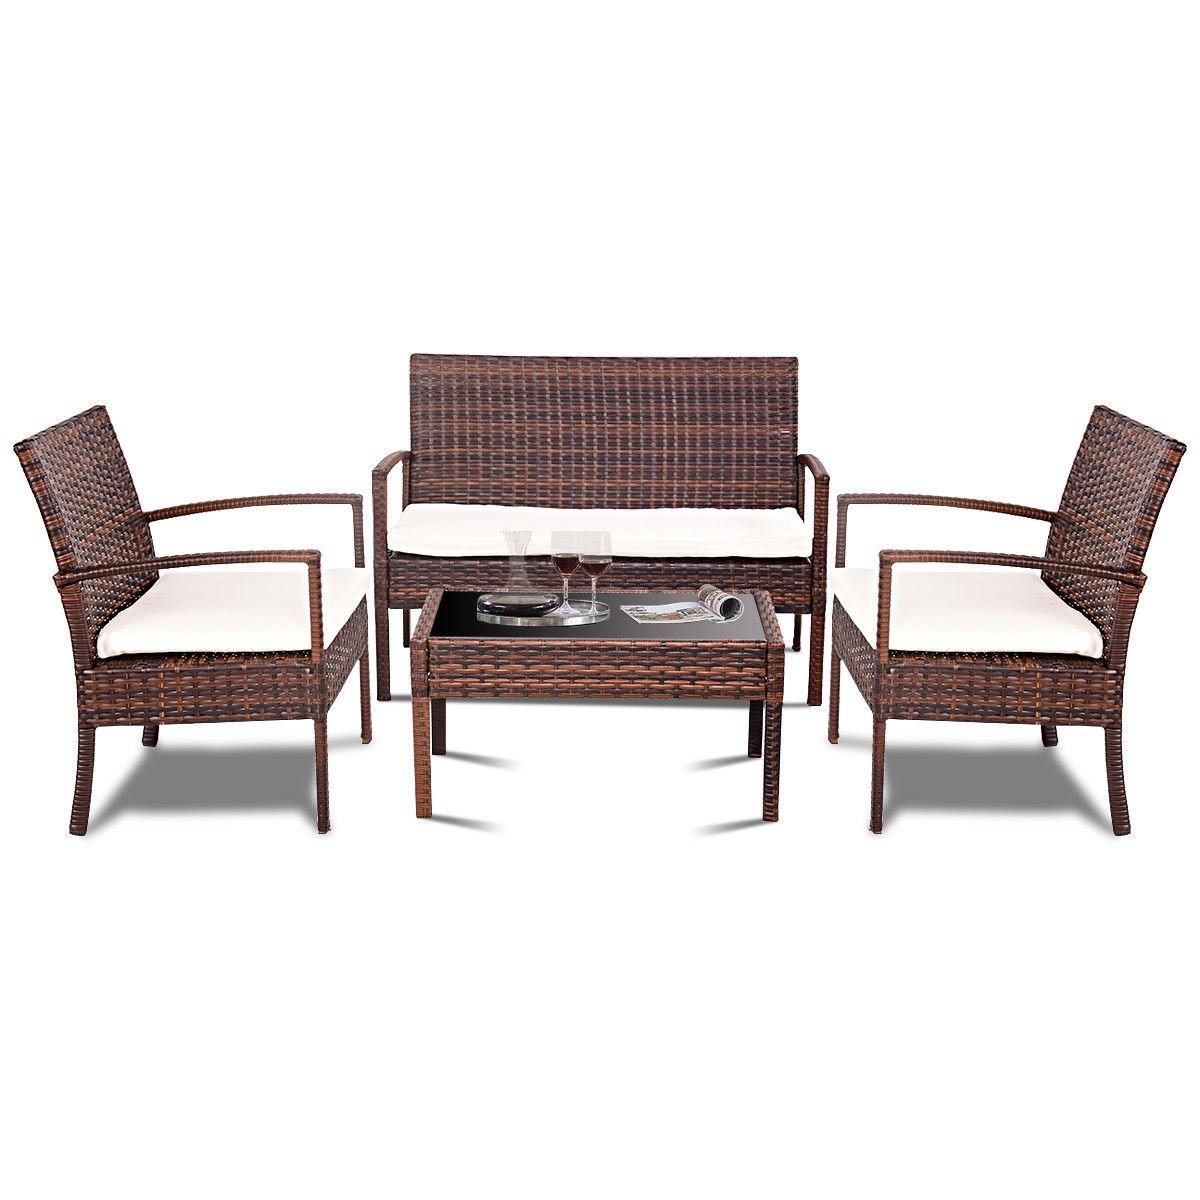 Rattan Patio Furniture Set 4 PC Steel, Rattan,Sponge Fashionable Style Modern Sofa Set Cushioned Seats